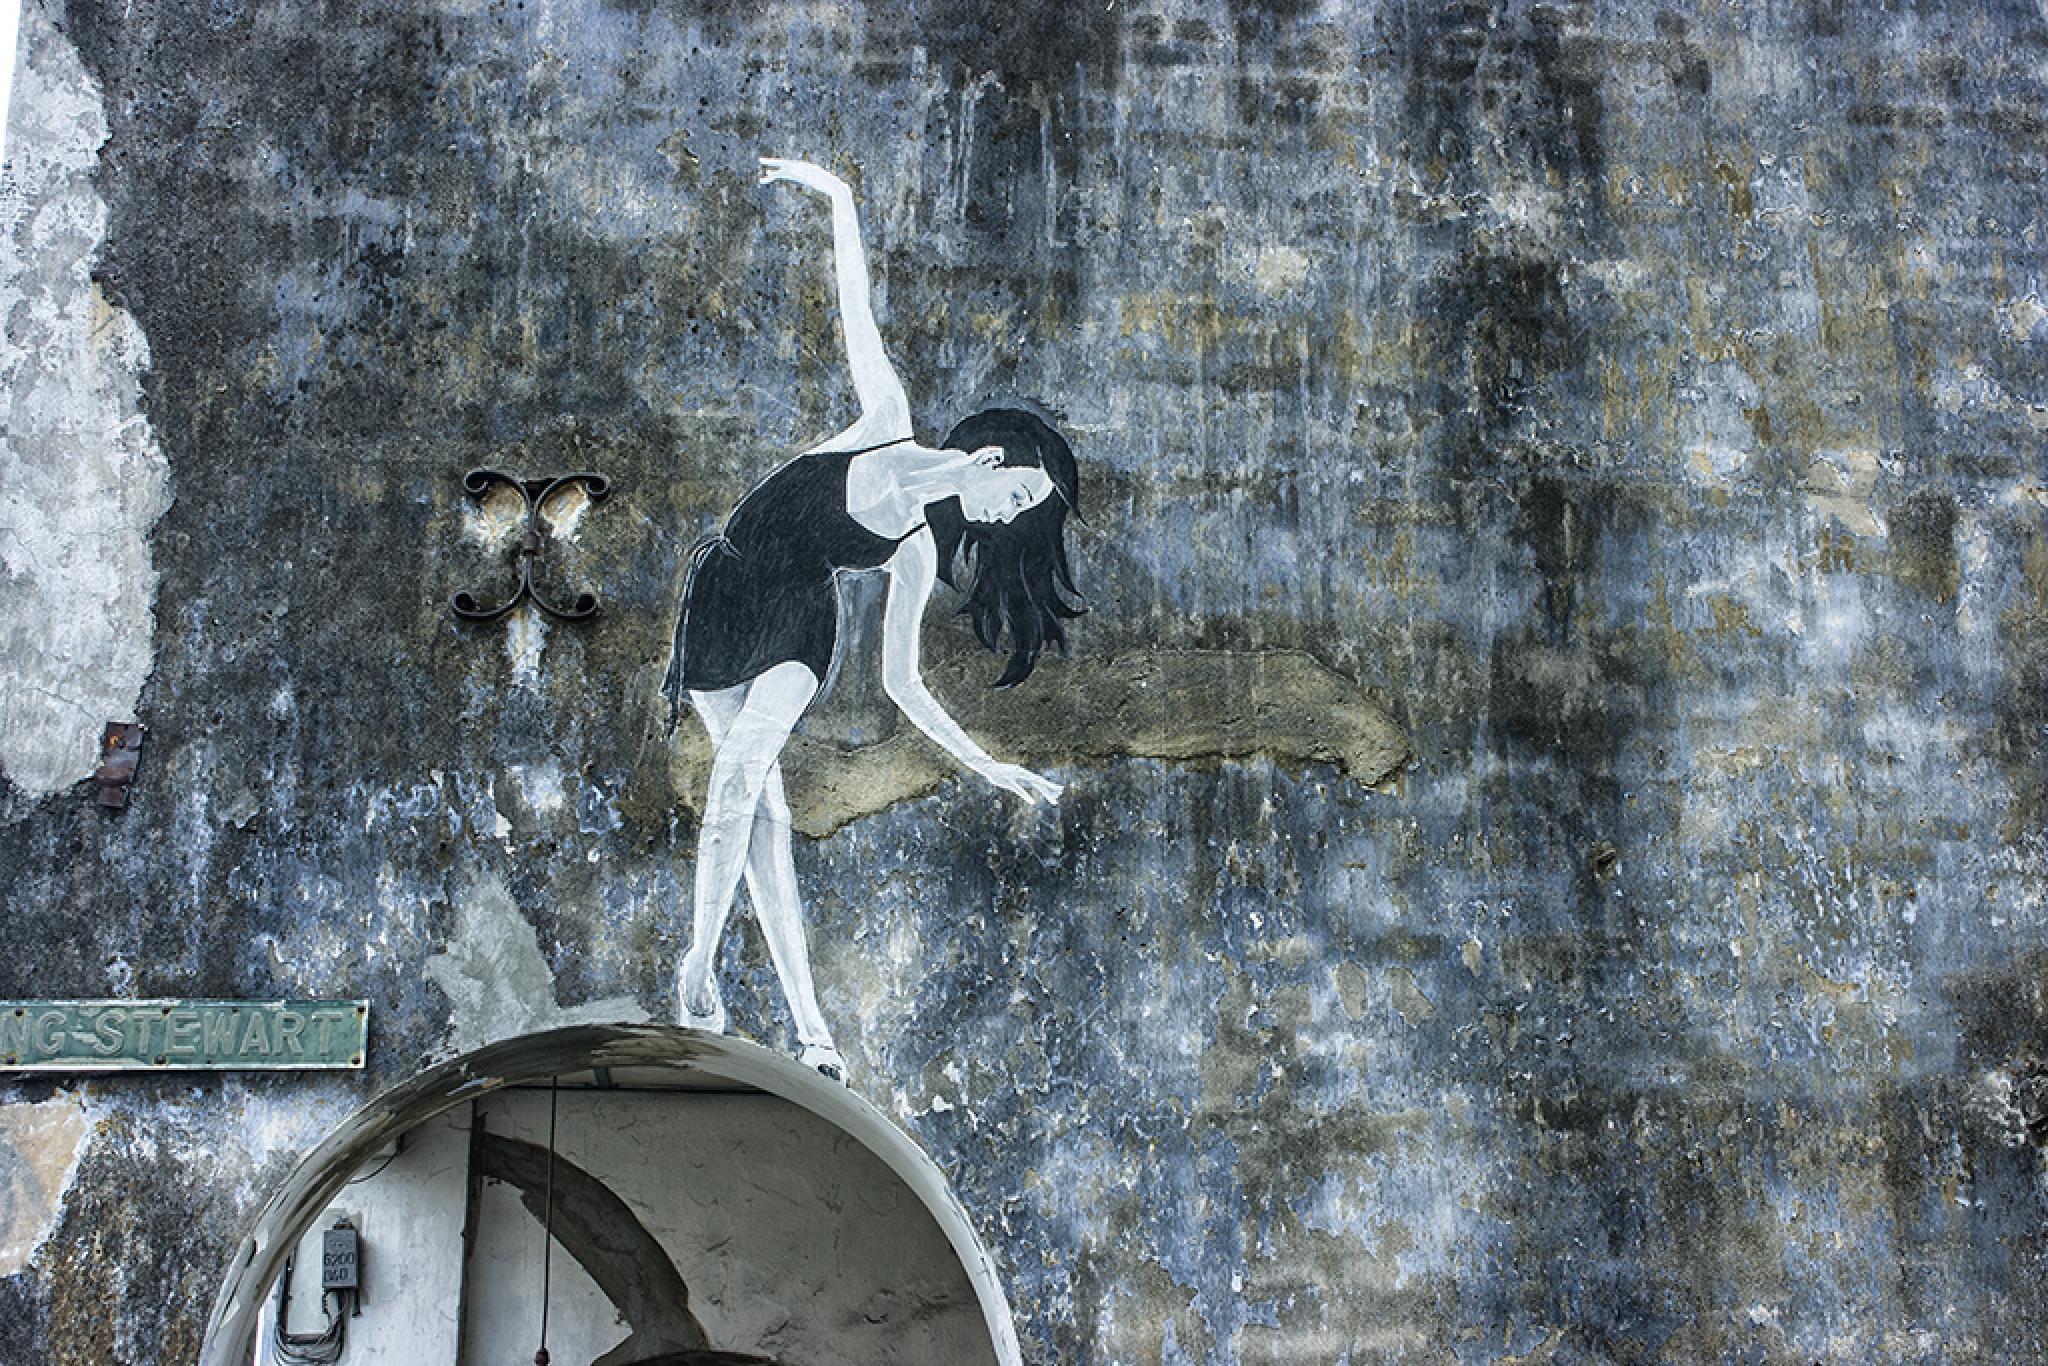 Dancer by Ronaldo Edson Reyes